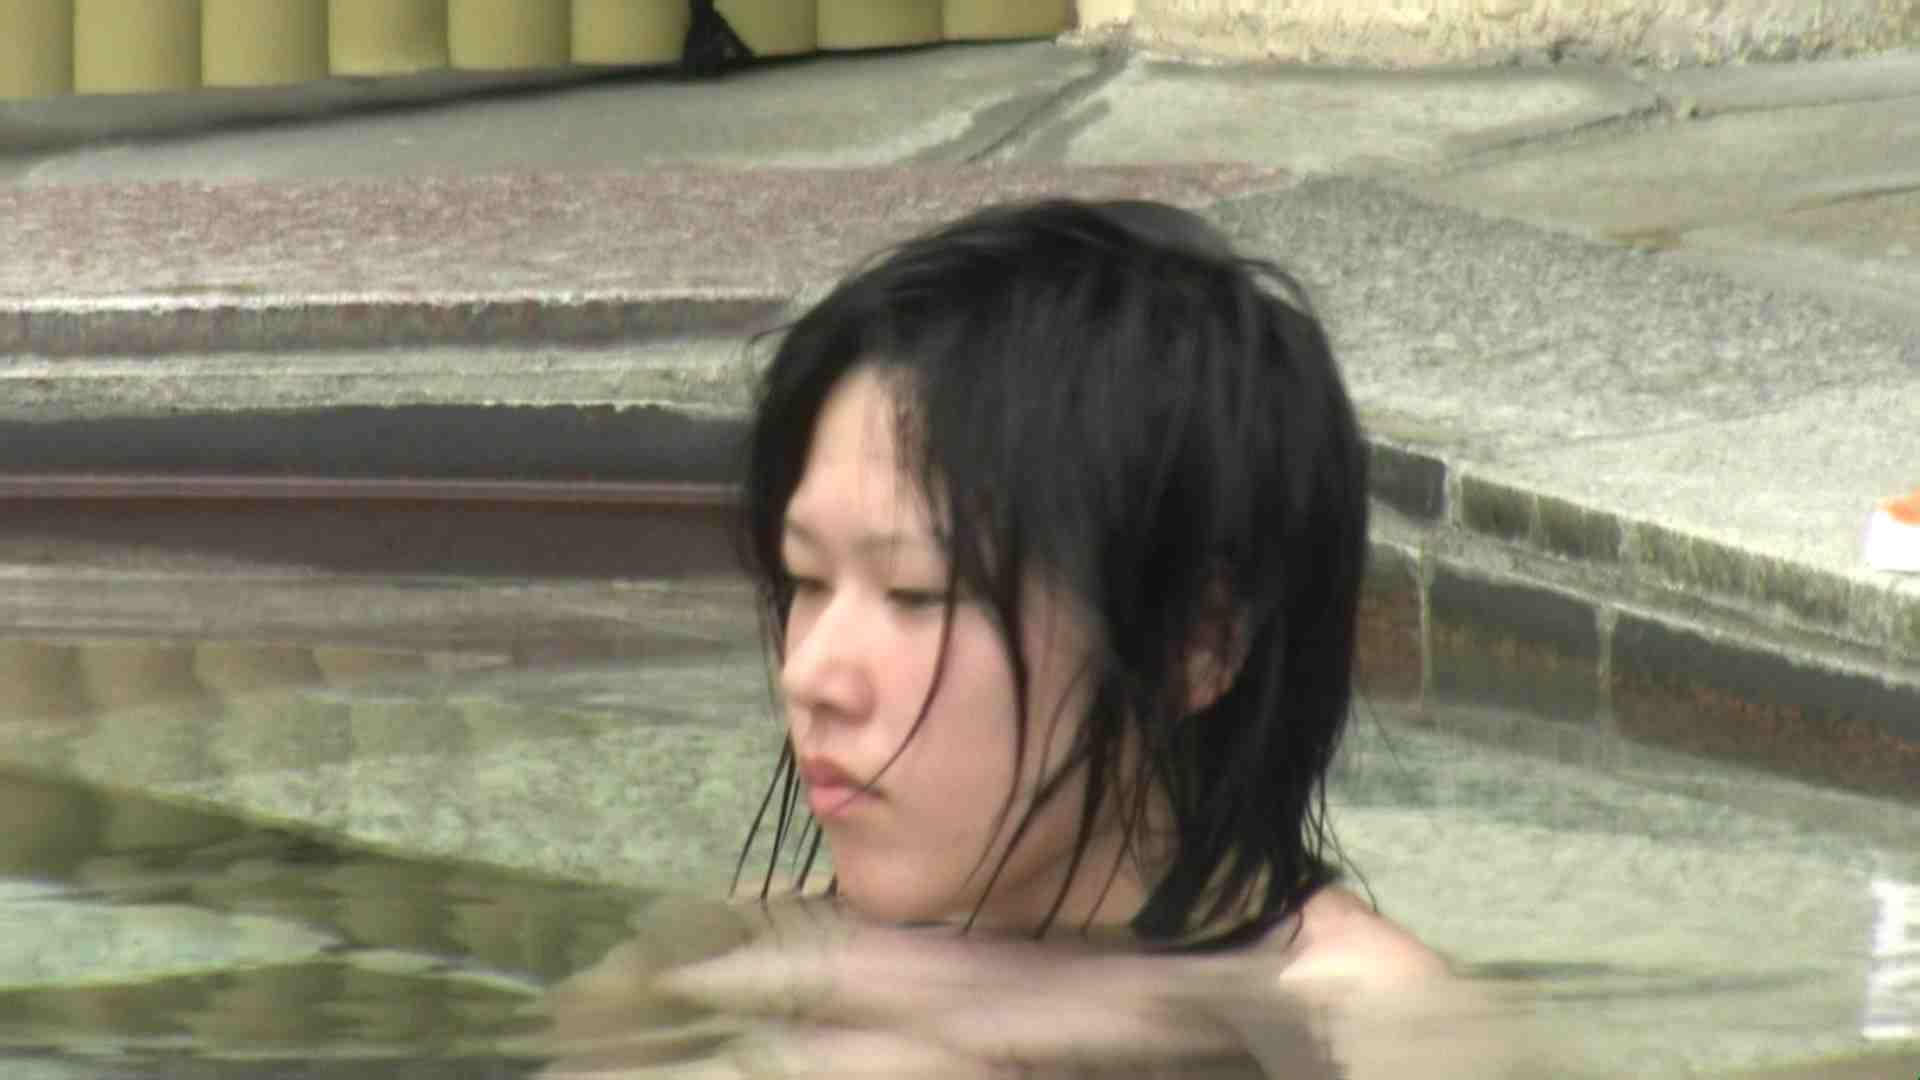 Aquaな露天風呂Vol.36 露天 のぞき動画画像 78連発 35